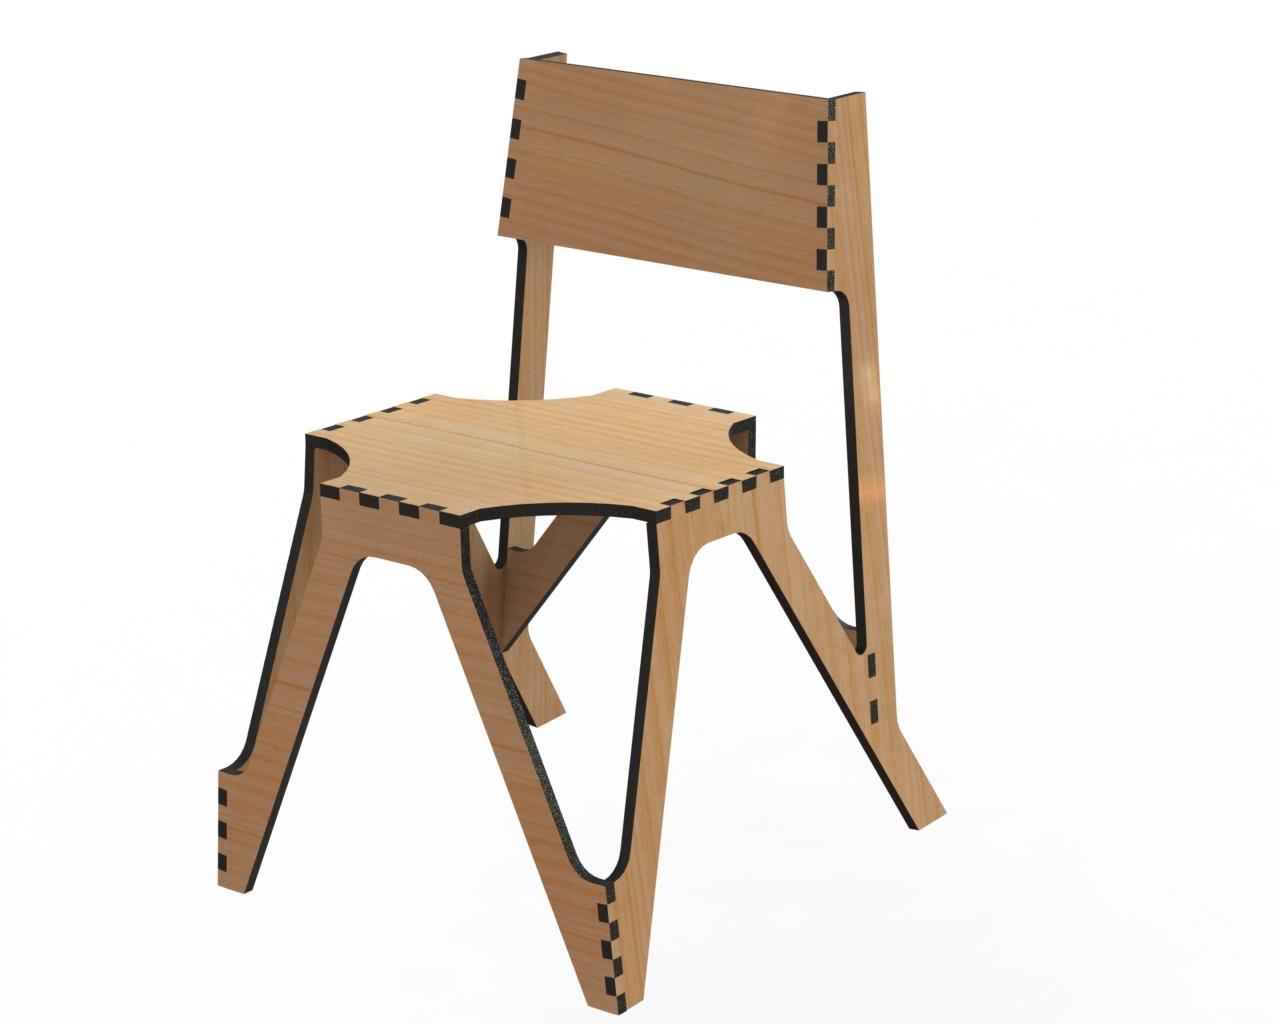 Chair Cadeira 12 Mm Free CDR Vectors Art